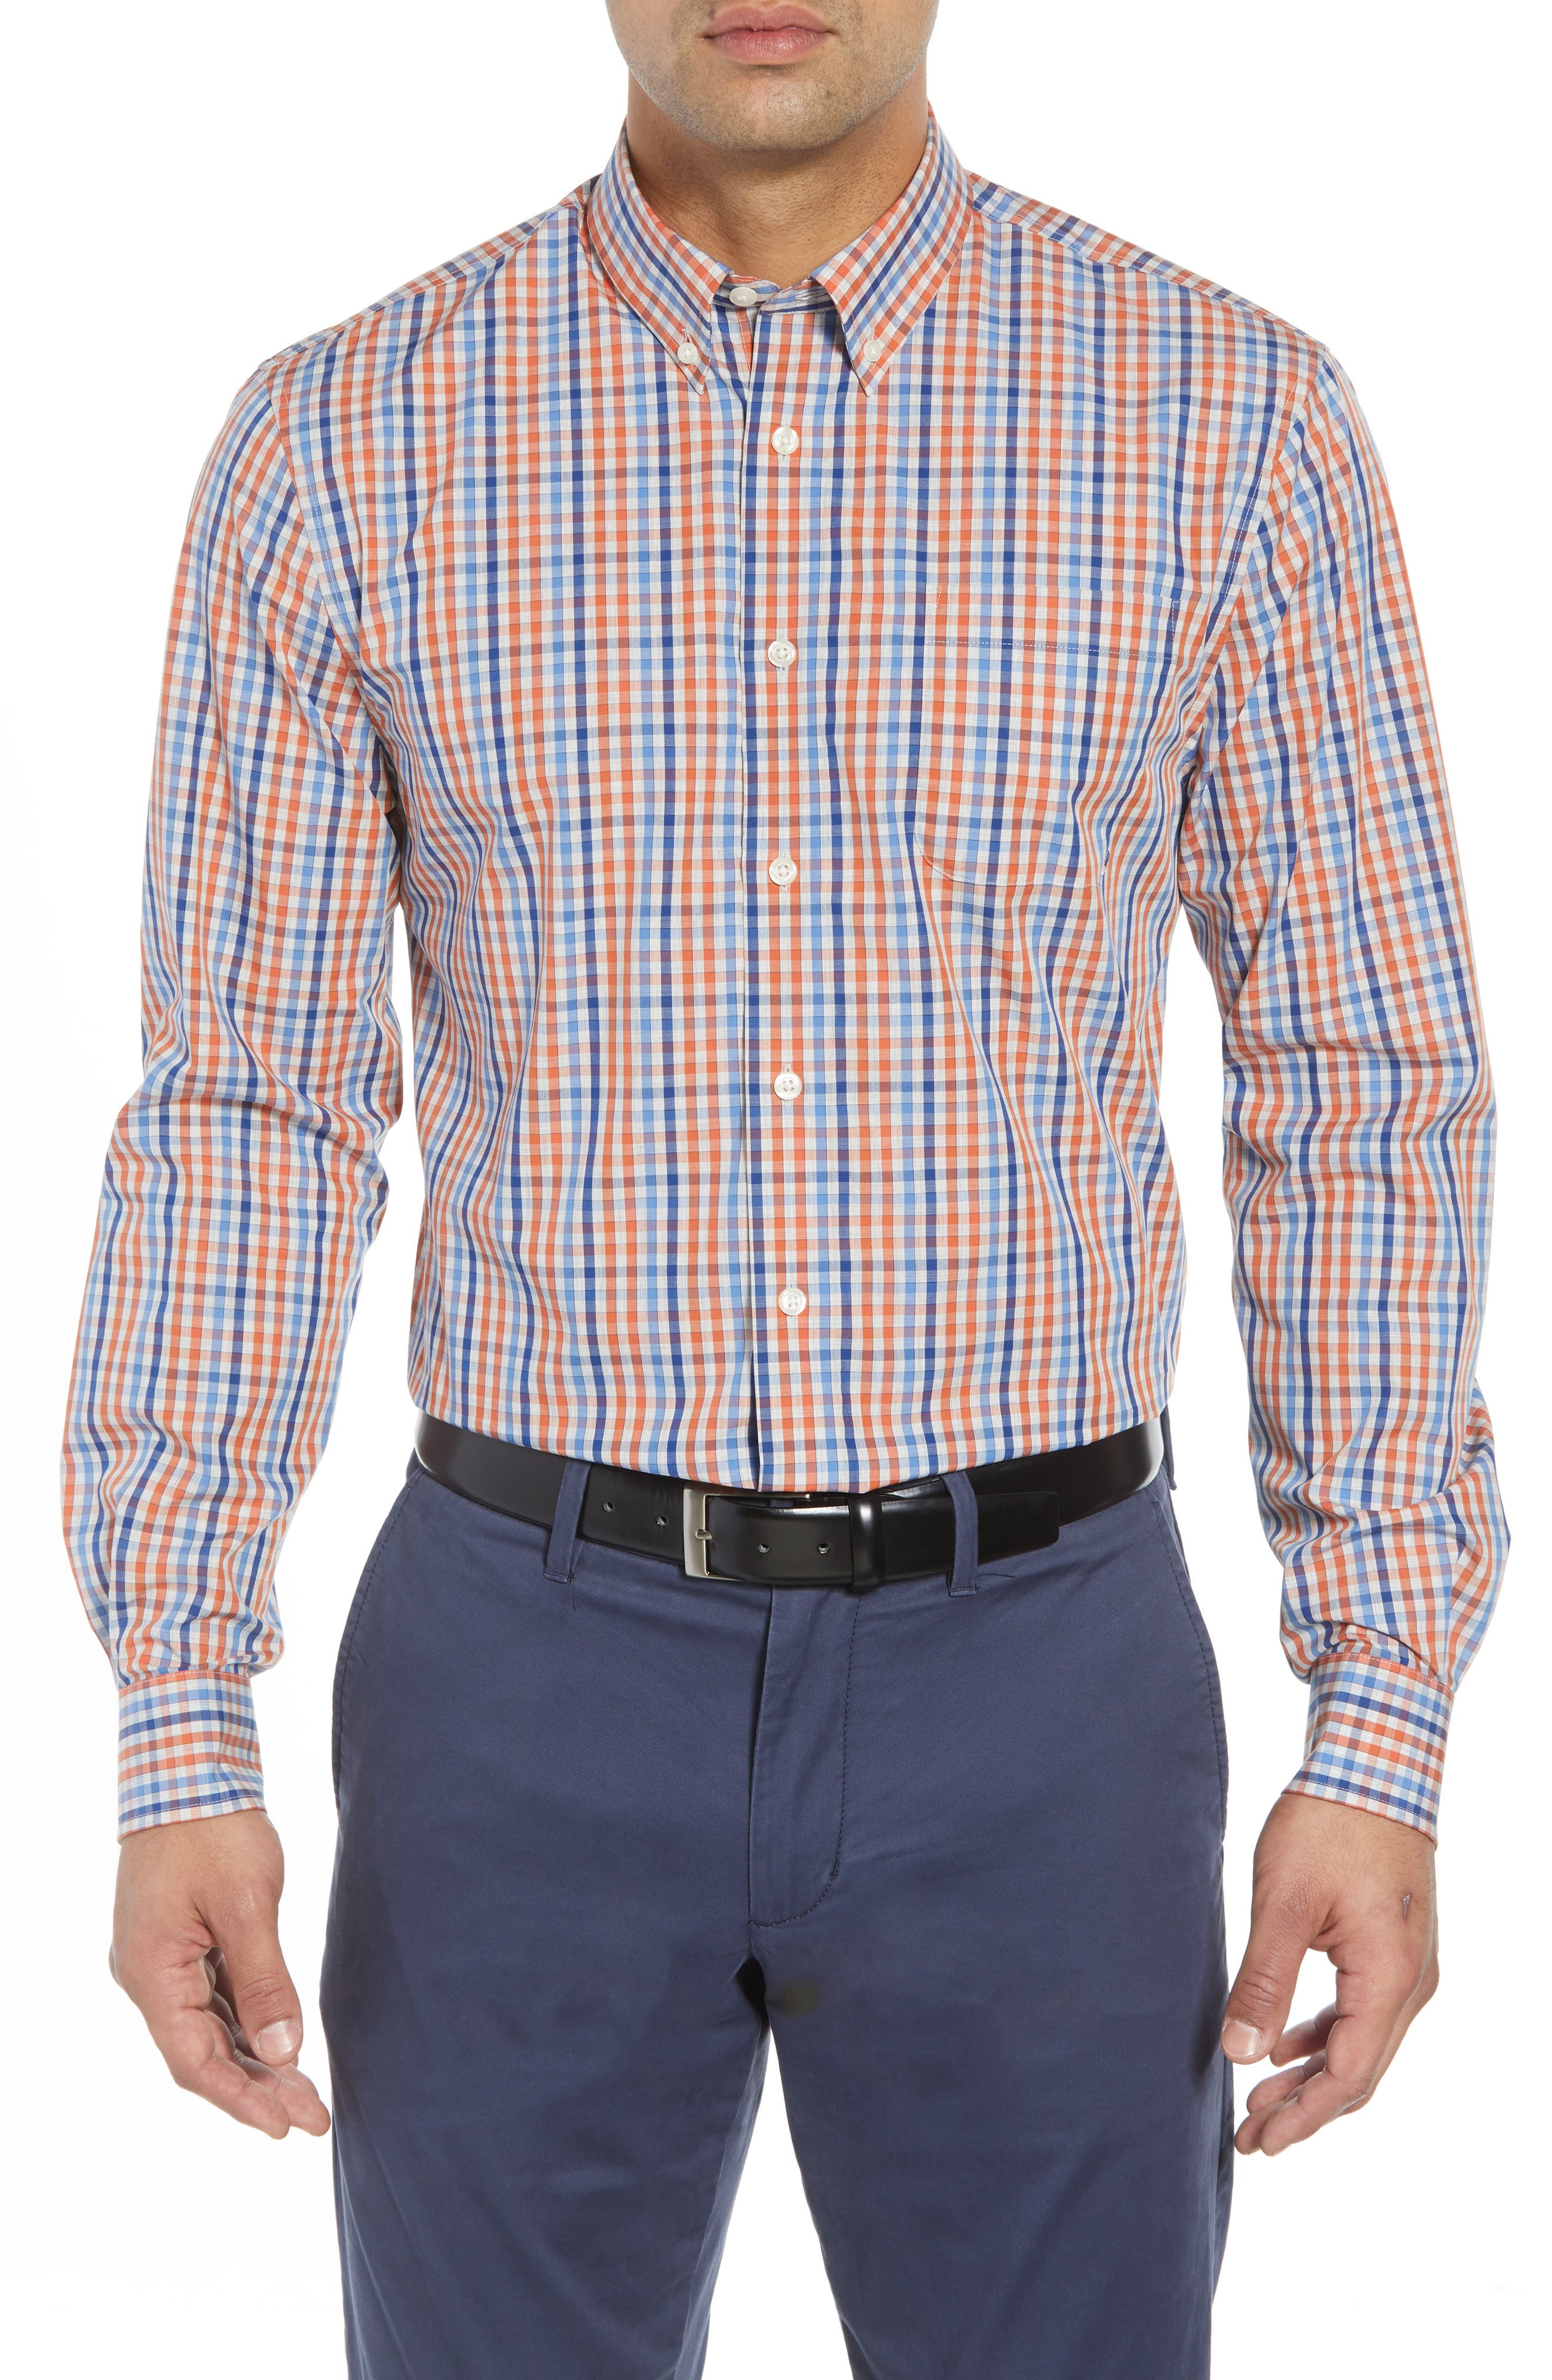 Rawlings Classic Fit Sport Shirt,                             Main thumbnail 1, color,                             MARINER